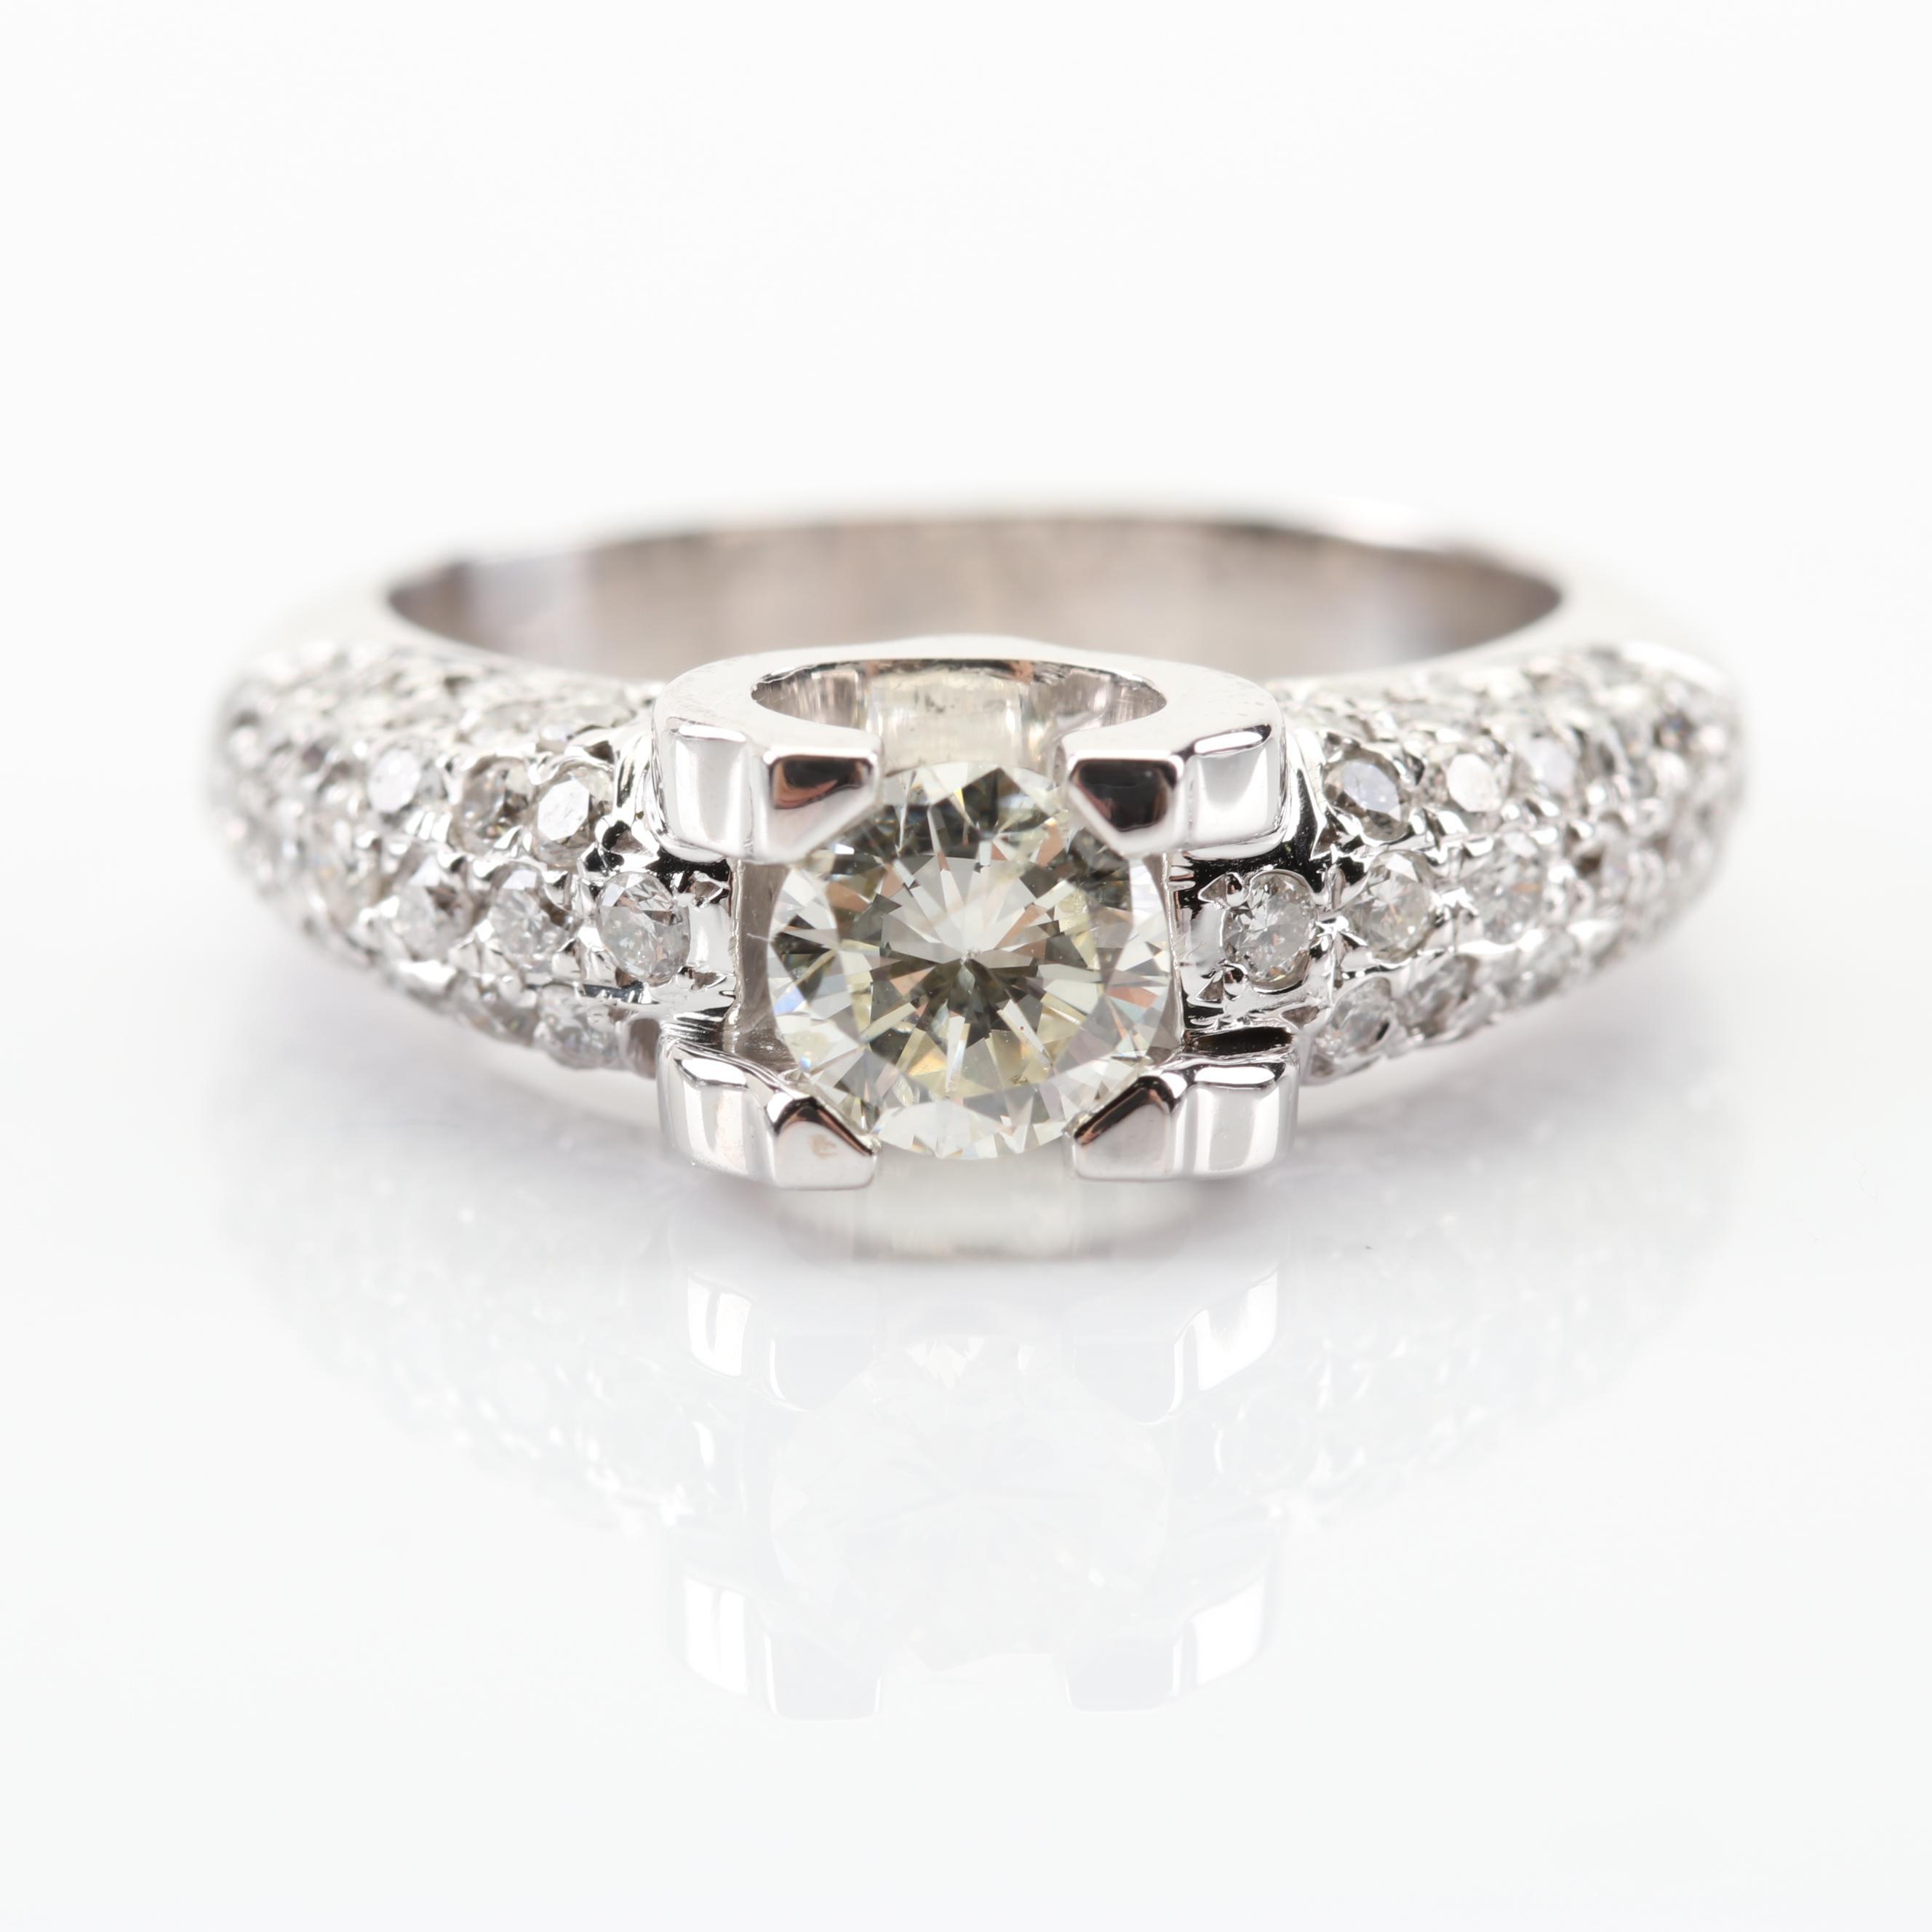 18K White Gold 1.60 CTW Diamond Ring